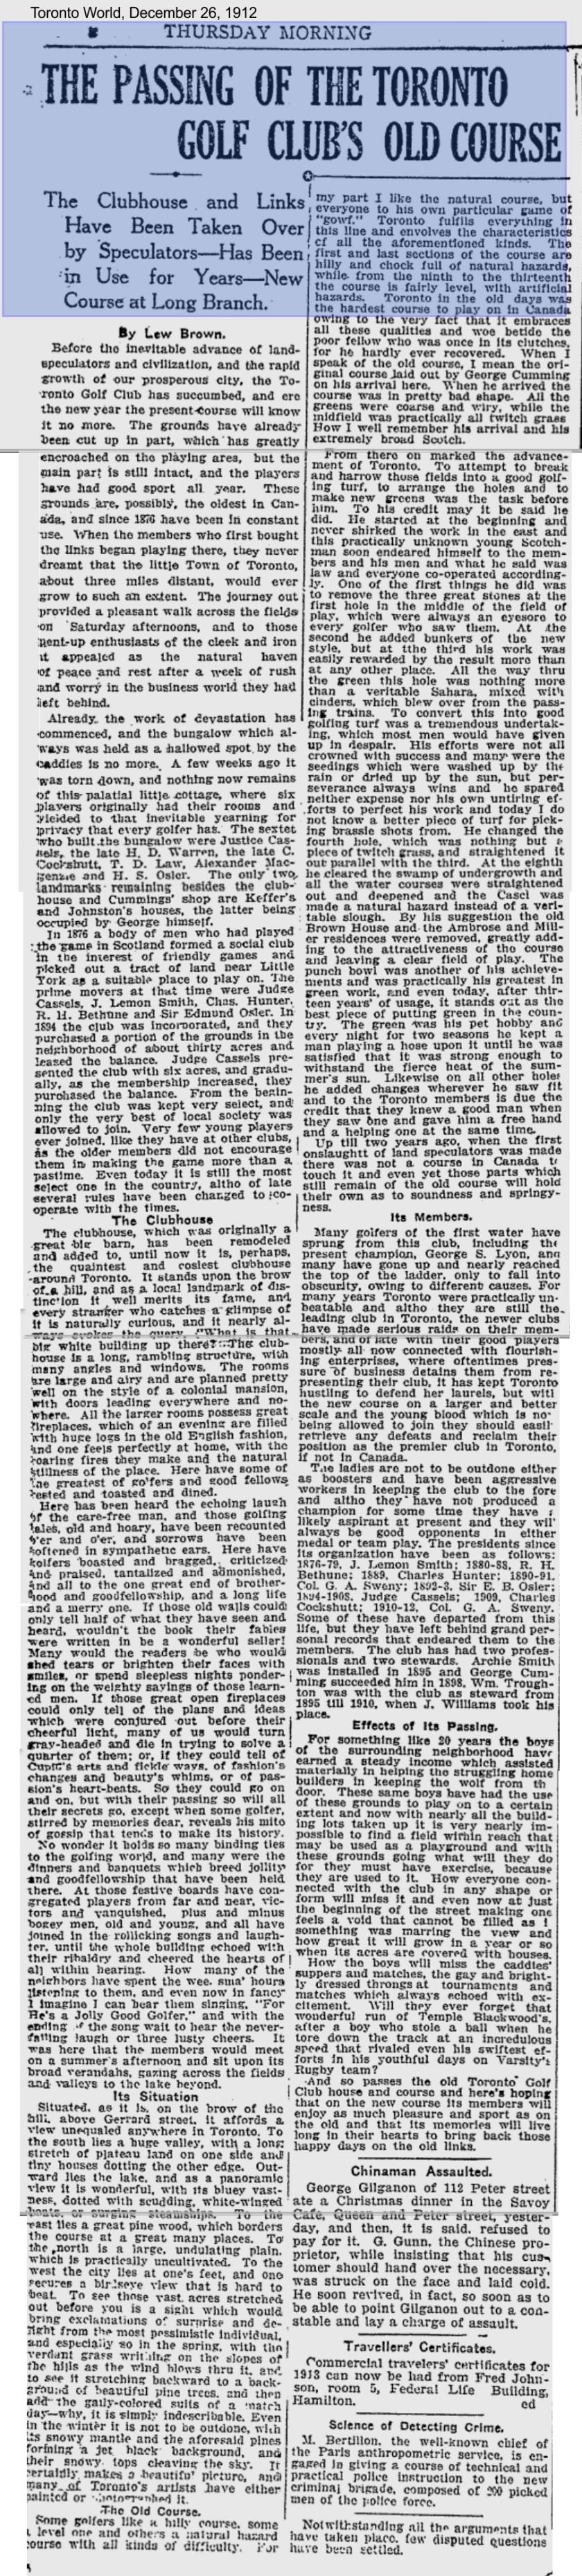 Toronto World, December 26, 1912